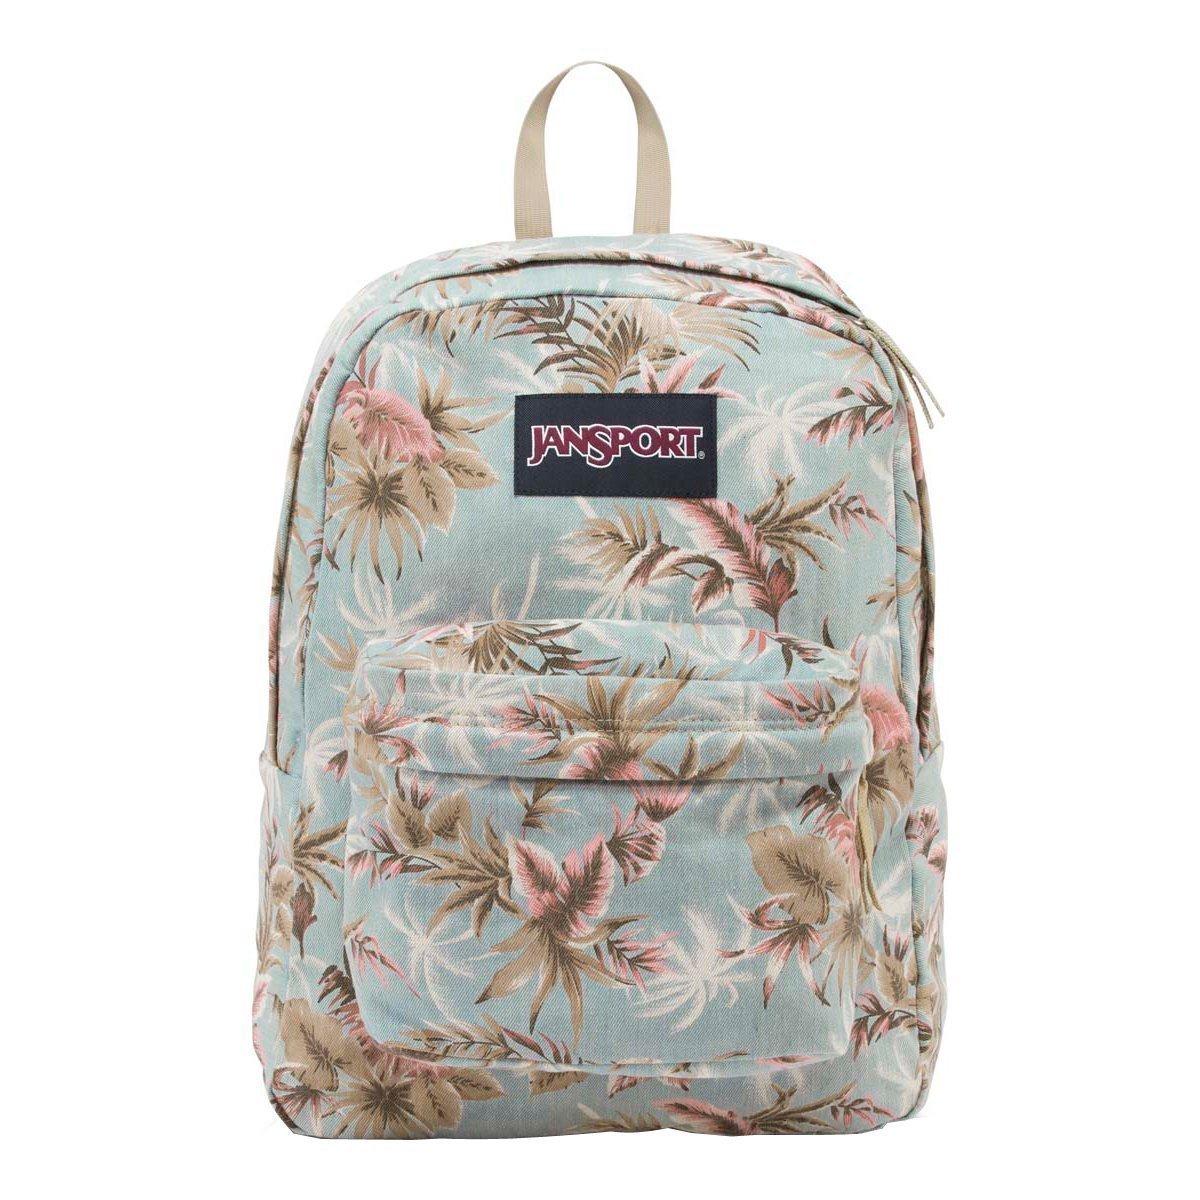 Amazon.com: JanSport Womens Classic Specialty Super FX Backpack - Multi Palm Denim / 16.7H X 13W X 8.5D: Computers & Accessories